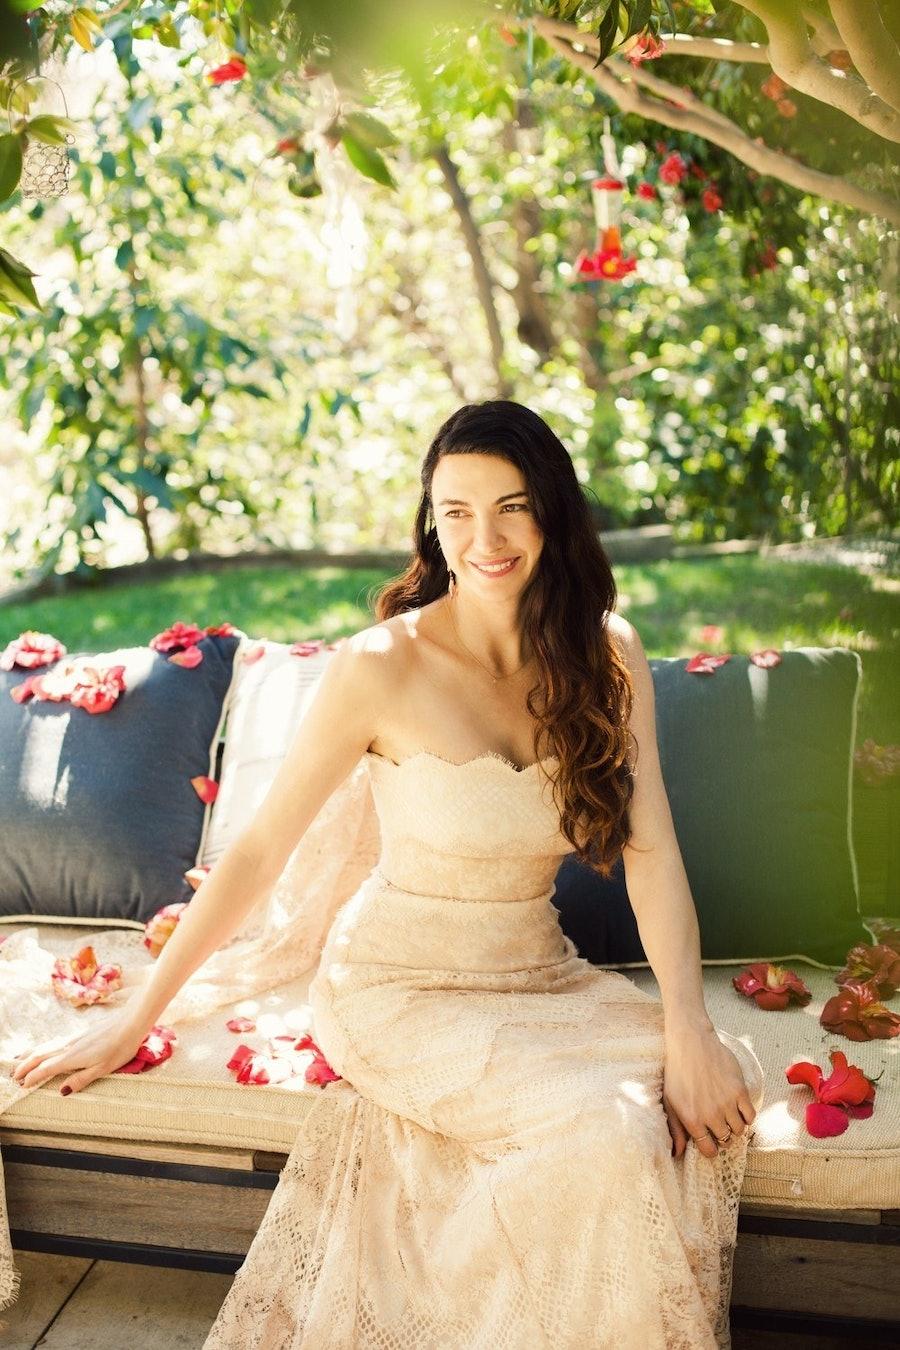 Shiva Rose 2 - Photography by Kimberly Genevieve.jpg